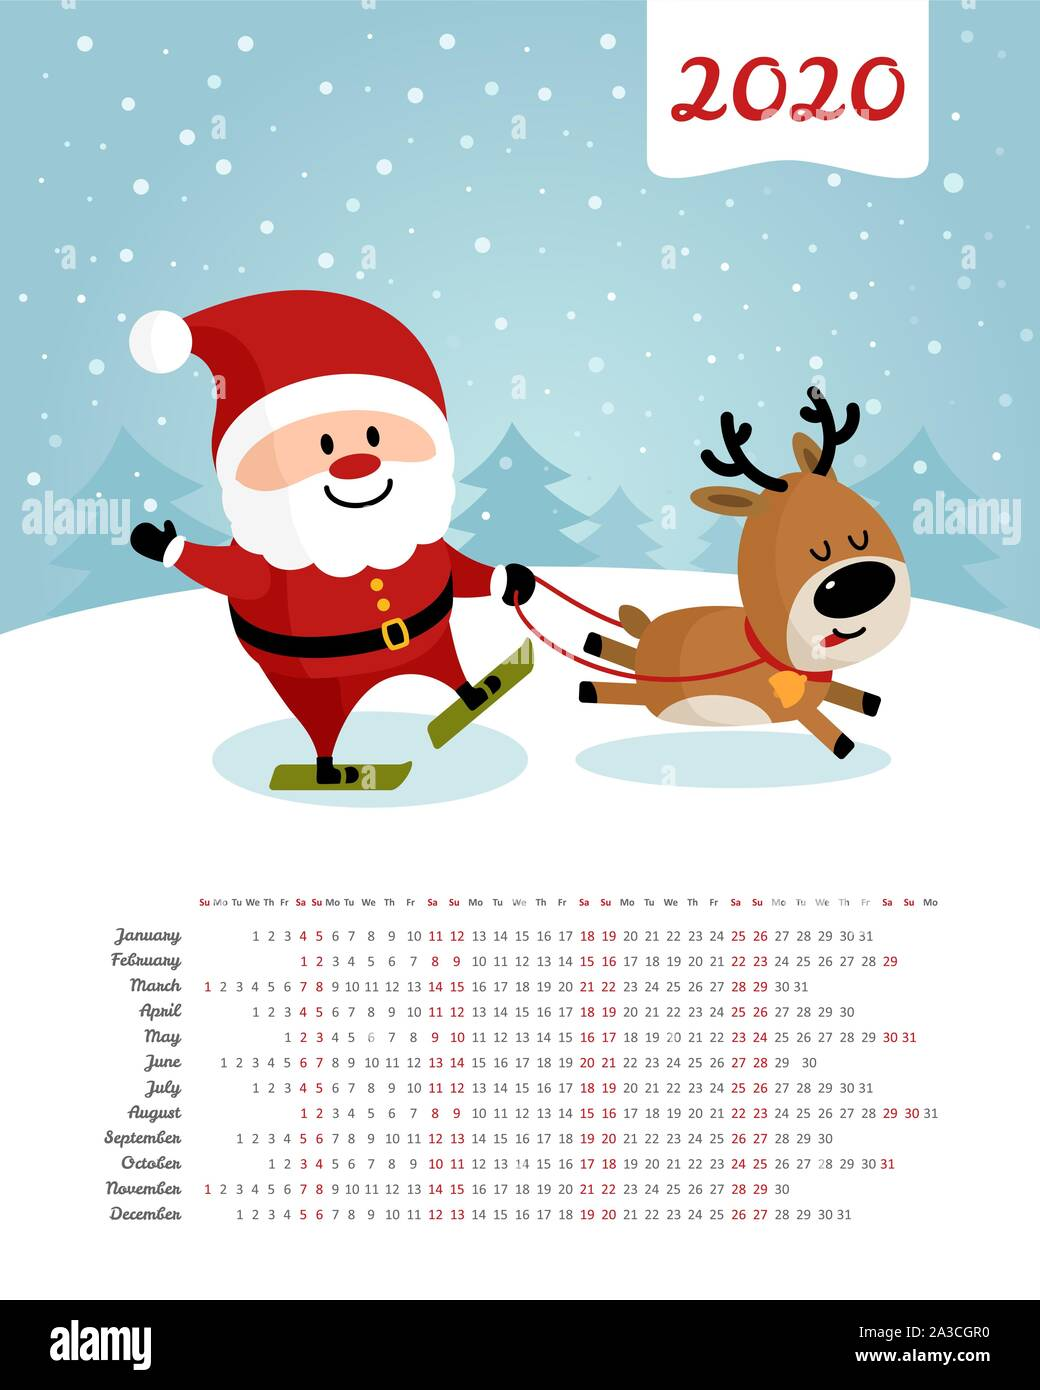 Christmas Skiing 2020 Calendar 2020 year. Santa Claus and deer skiing. Merry Christmas